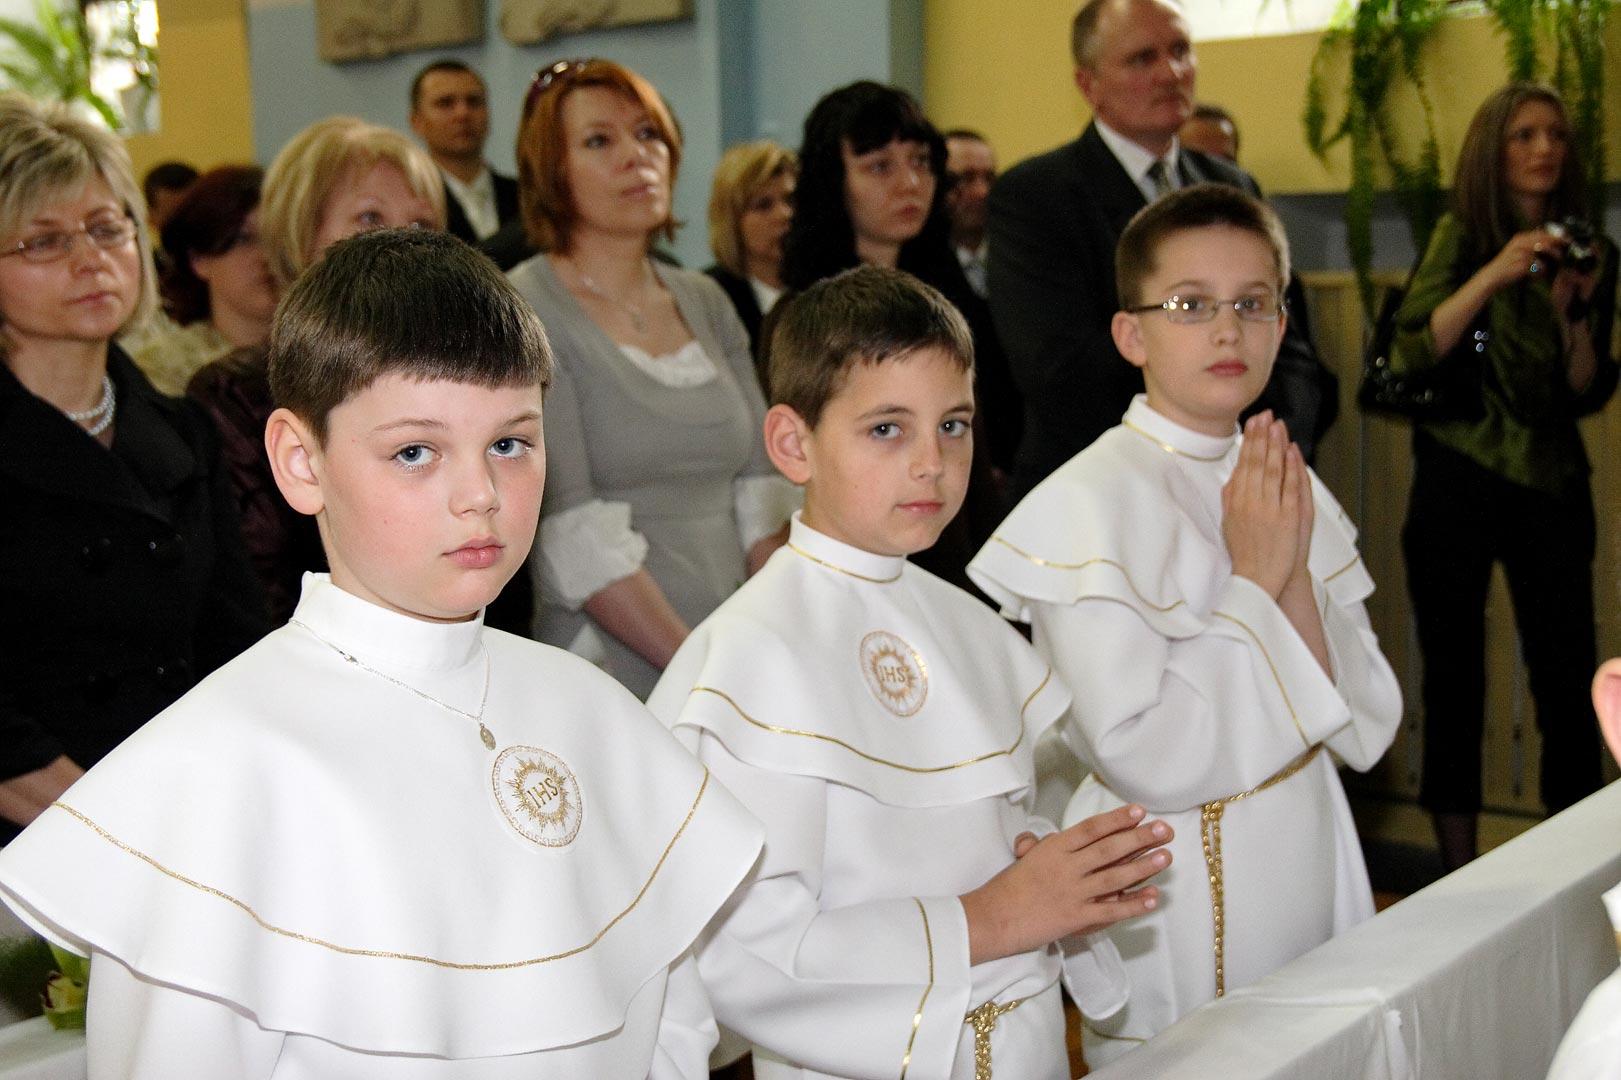 015-communion